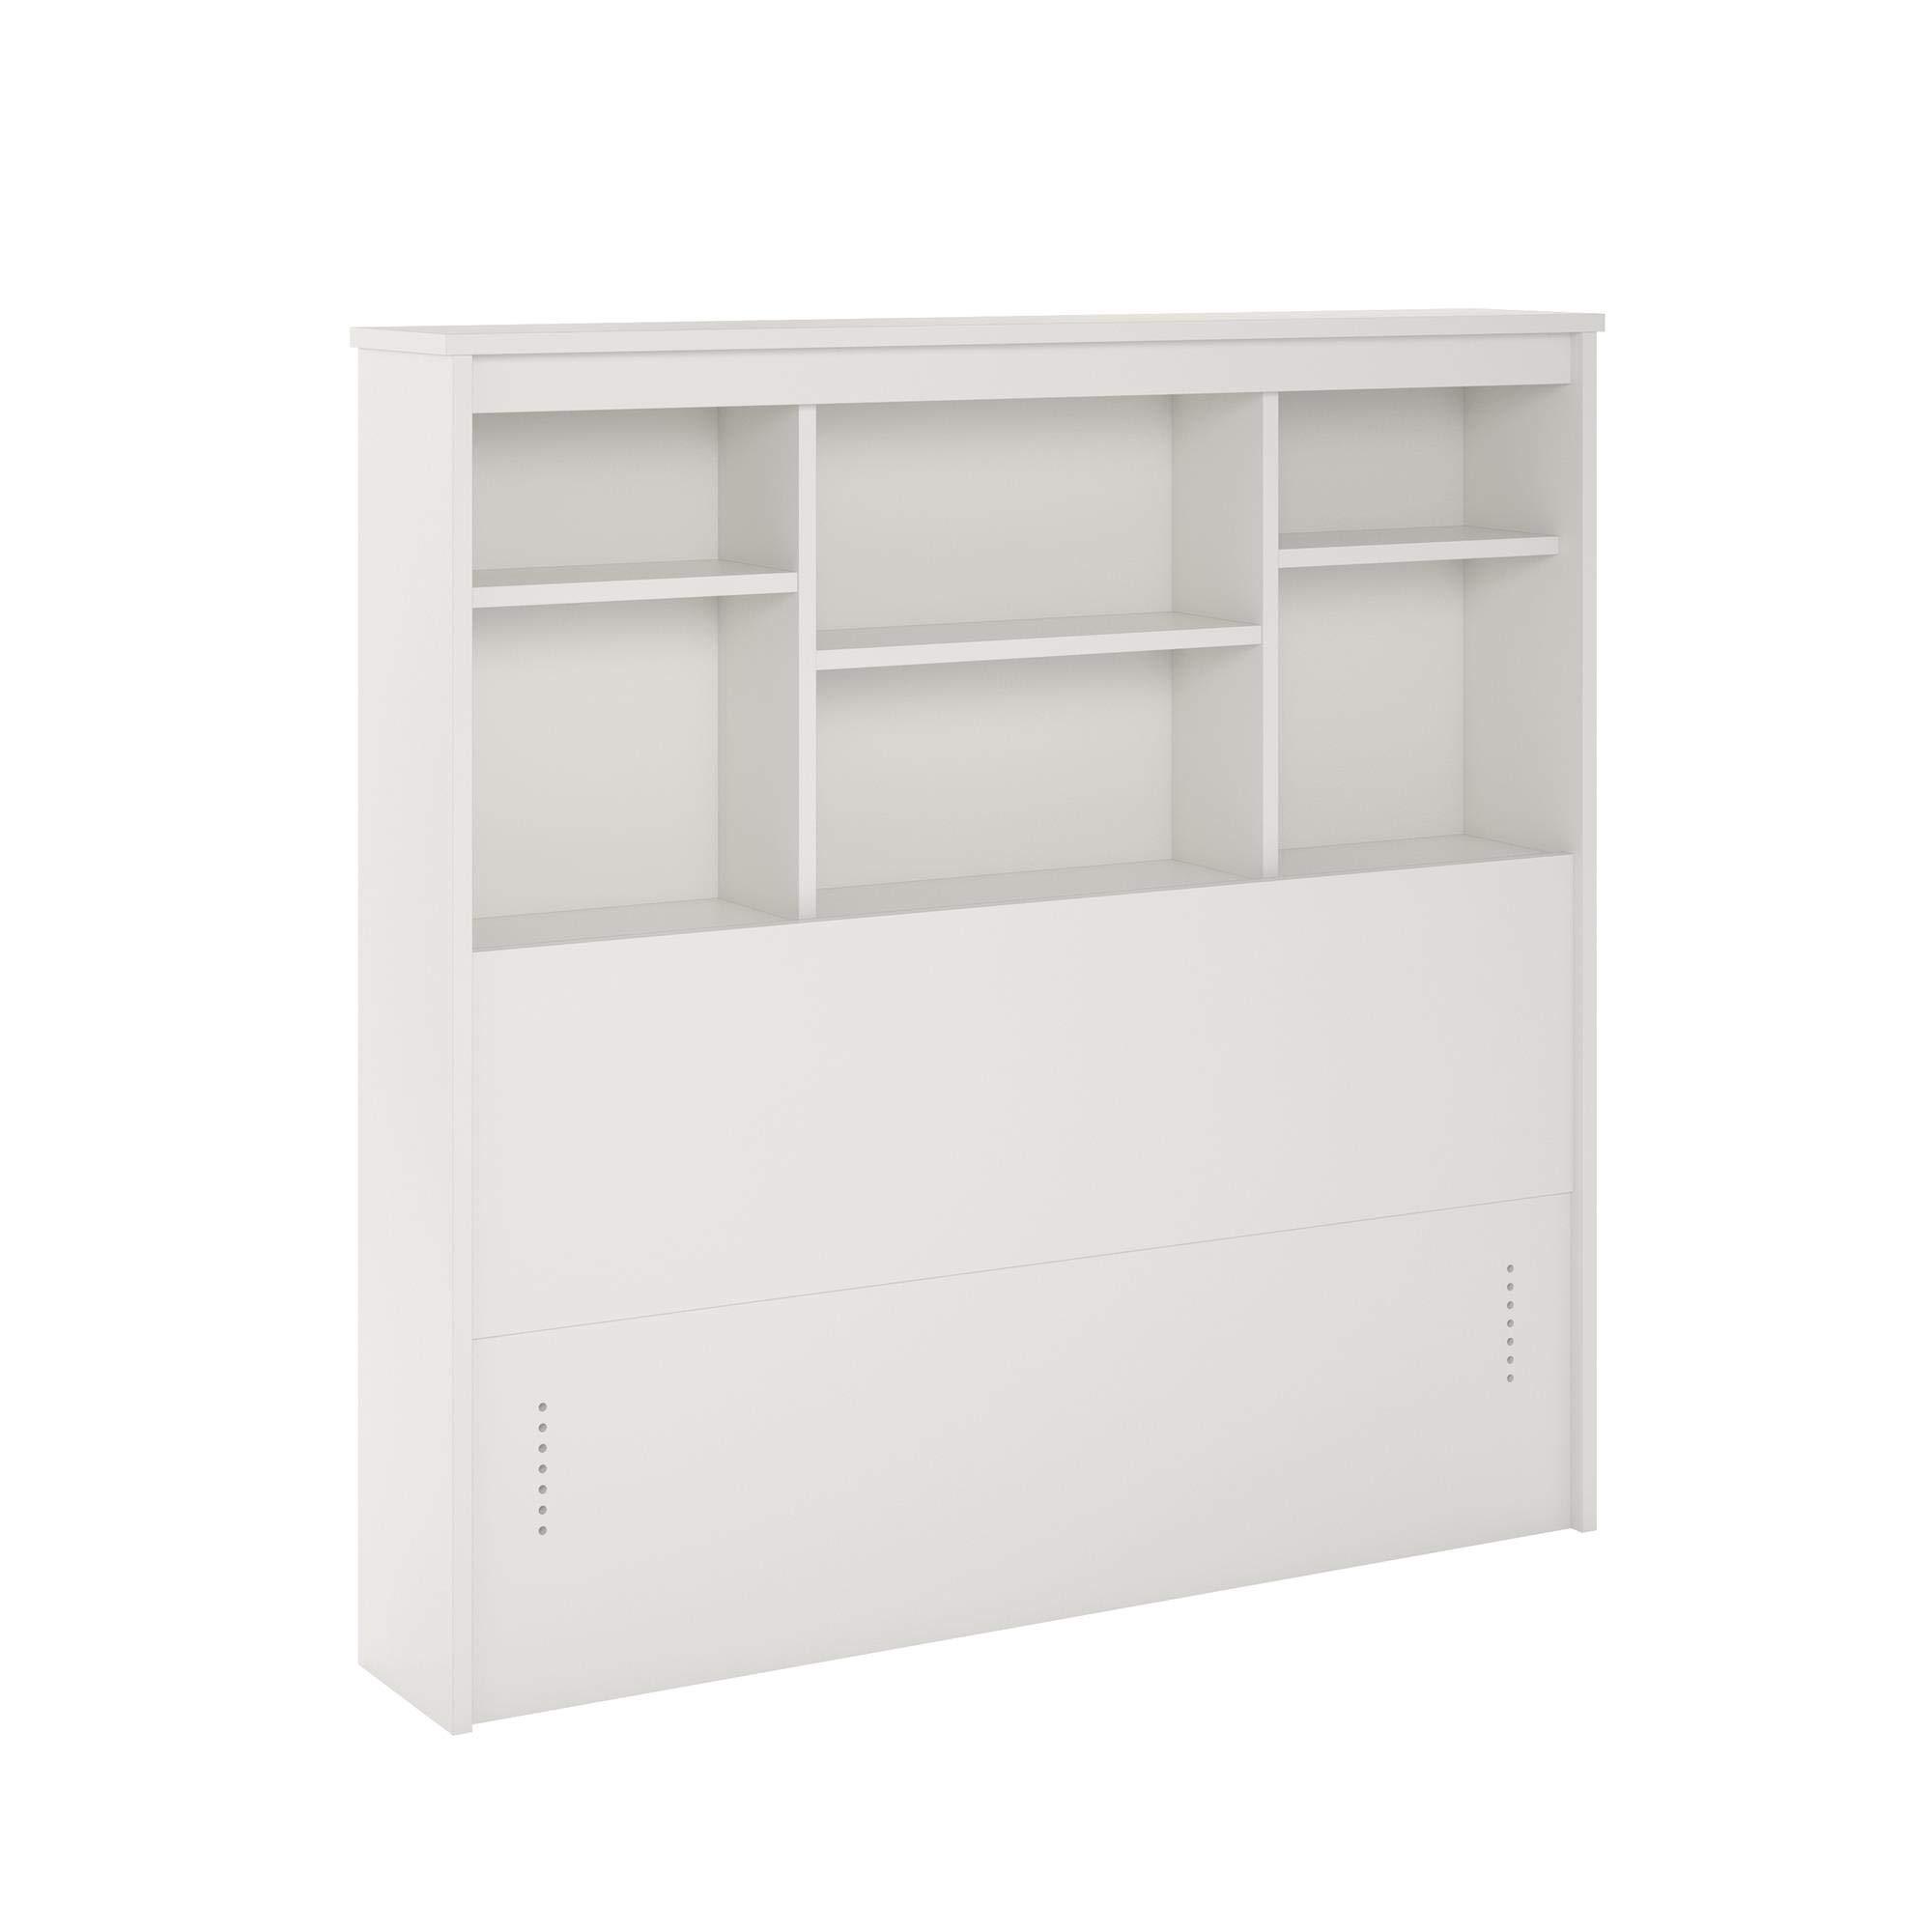 REALROOMS Lacey Twin Storage Headboard, White